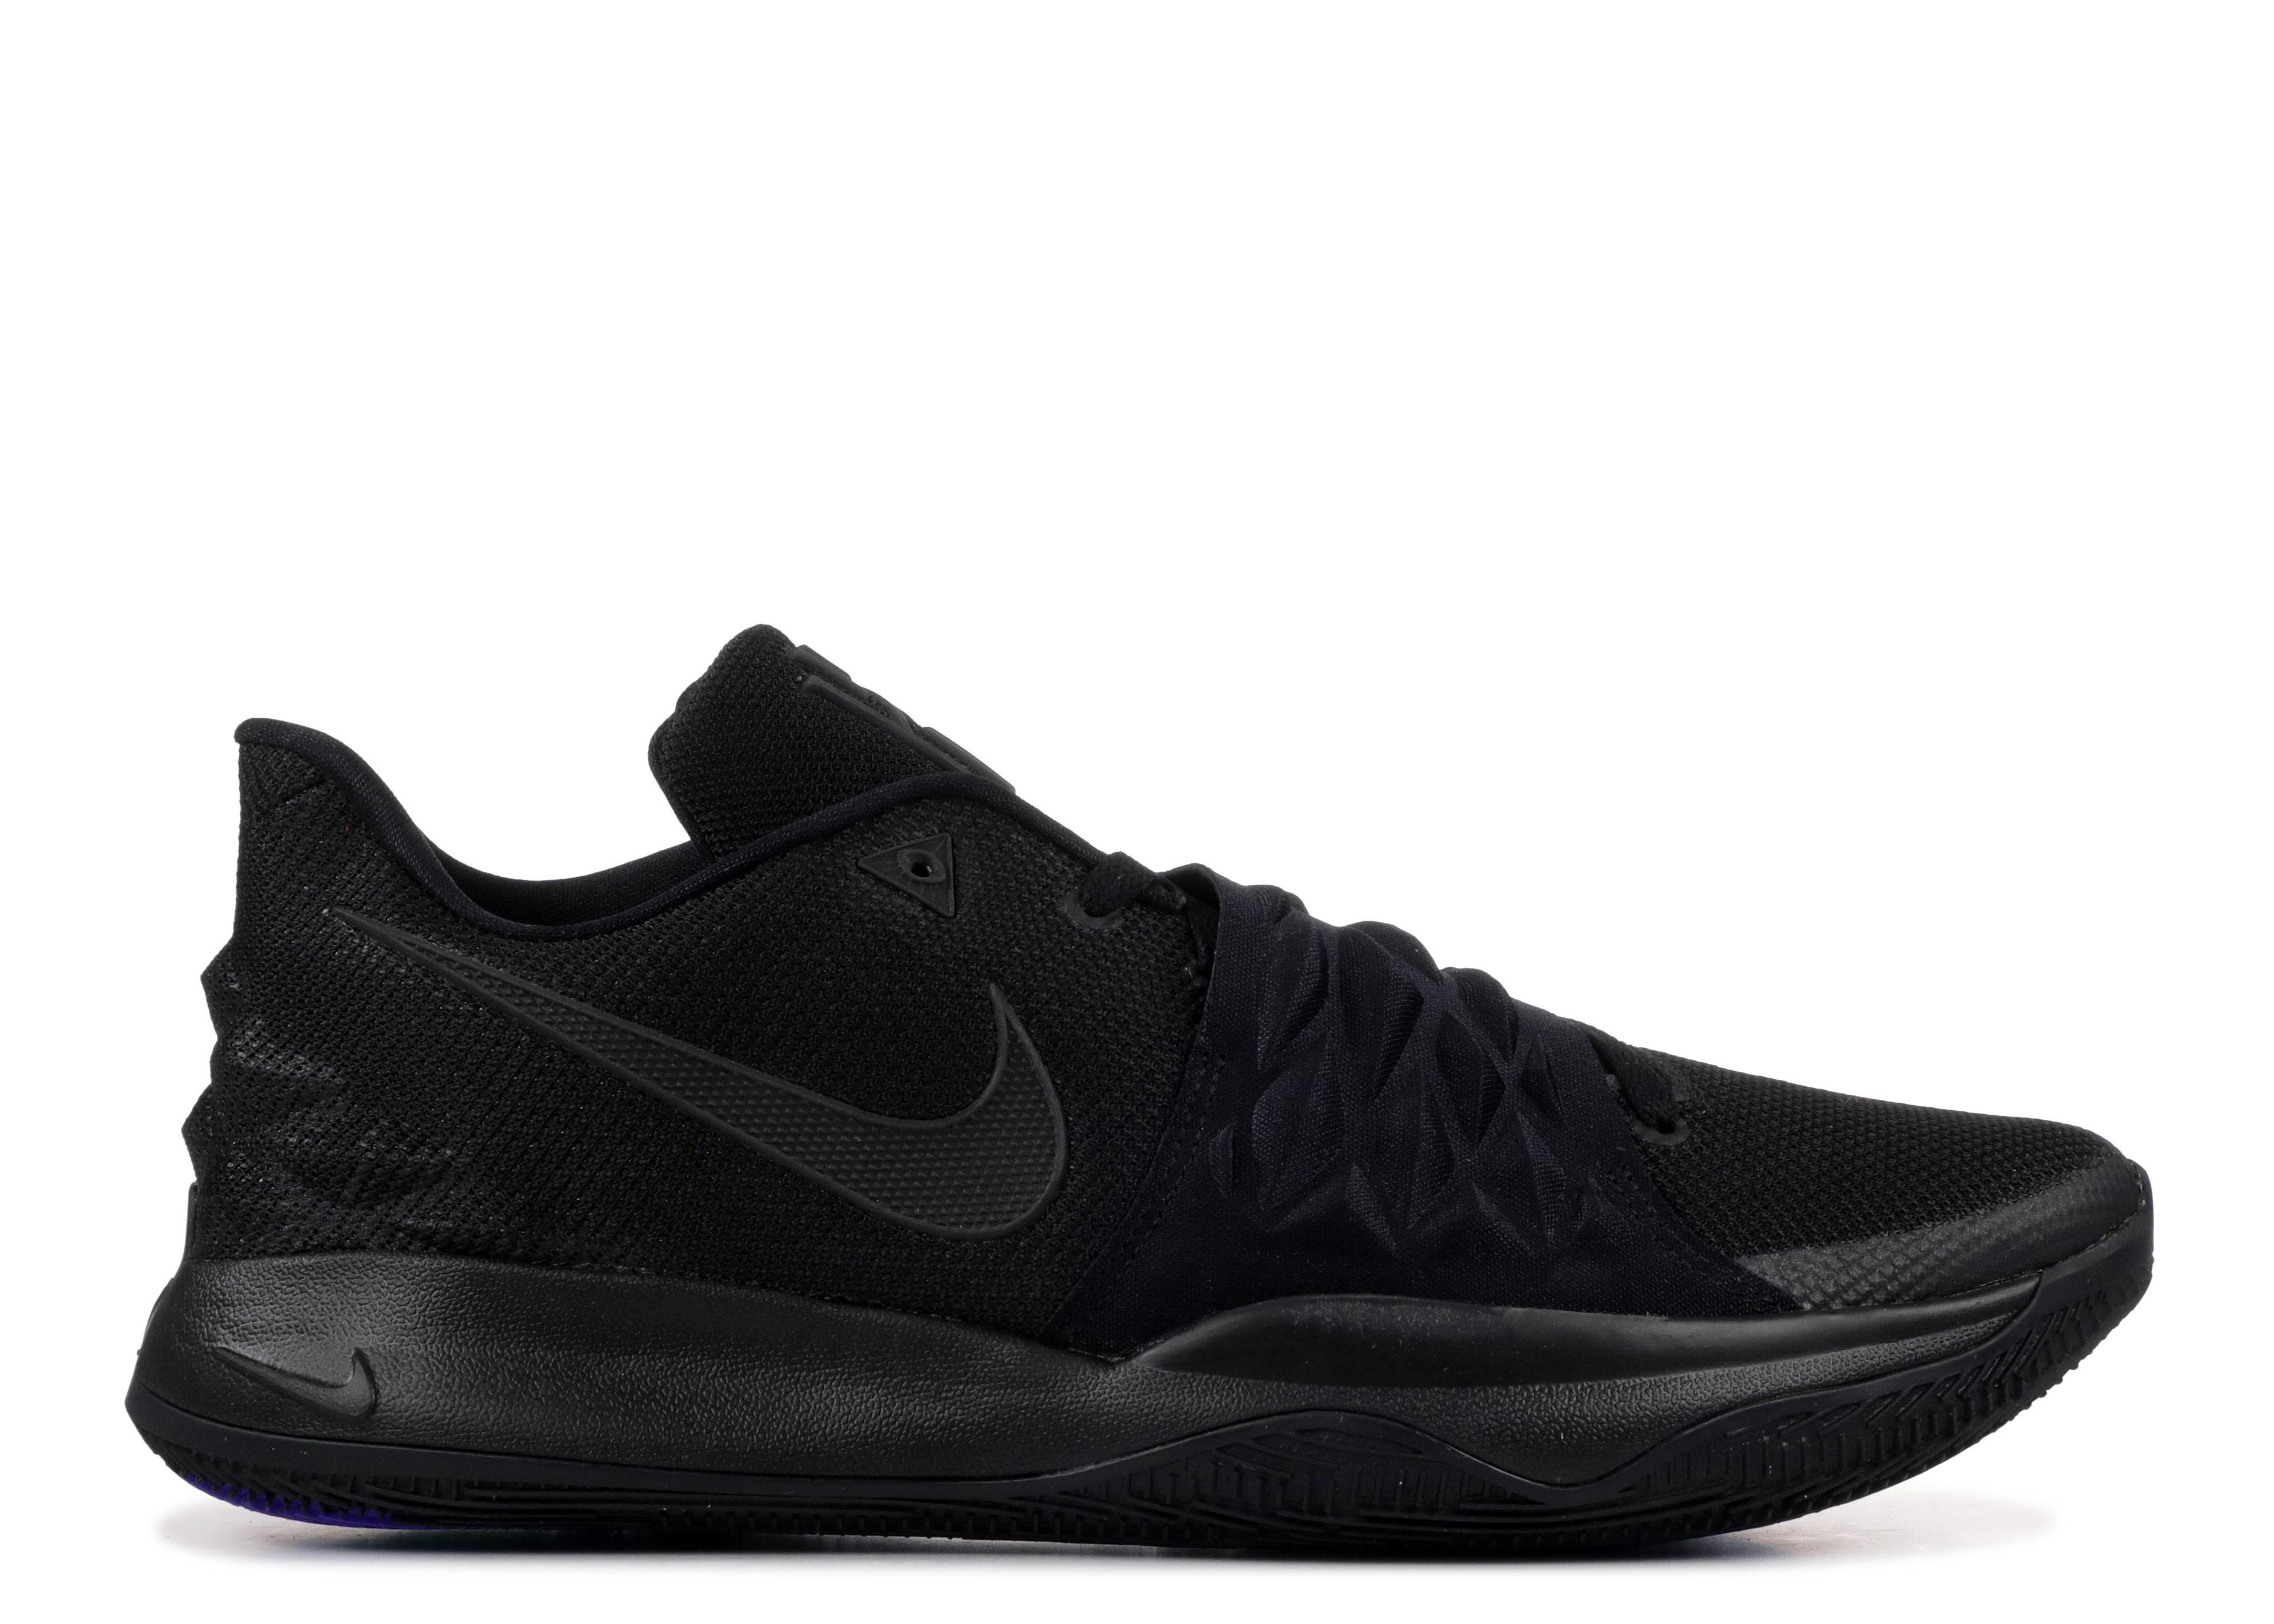 fcf9e654d5c2 Nike Kyrie Low Ep